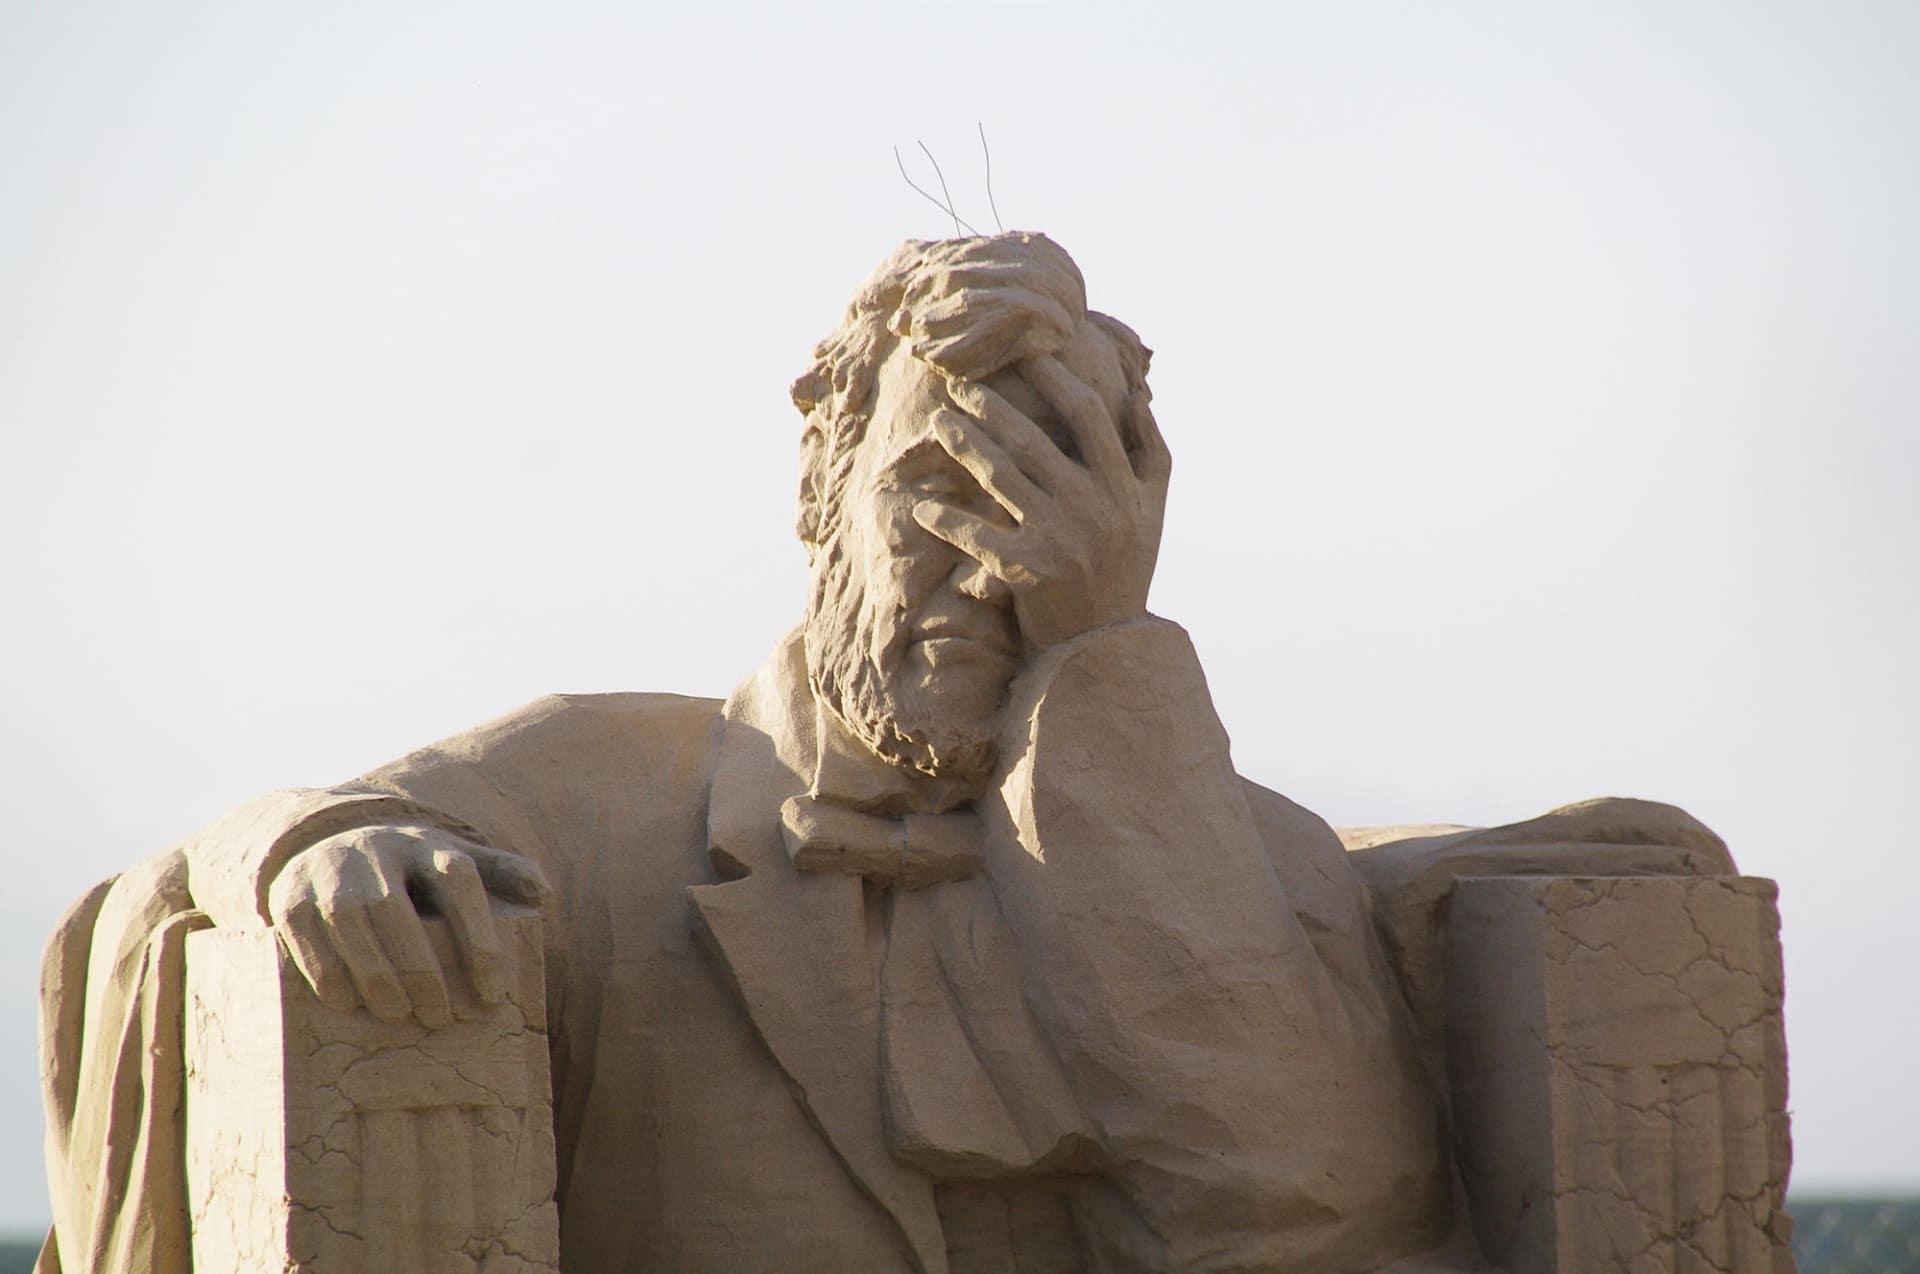 Liberty is Crumbling